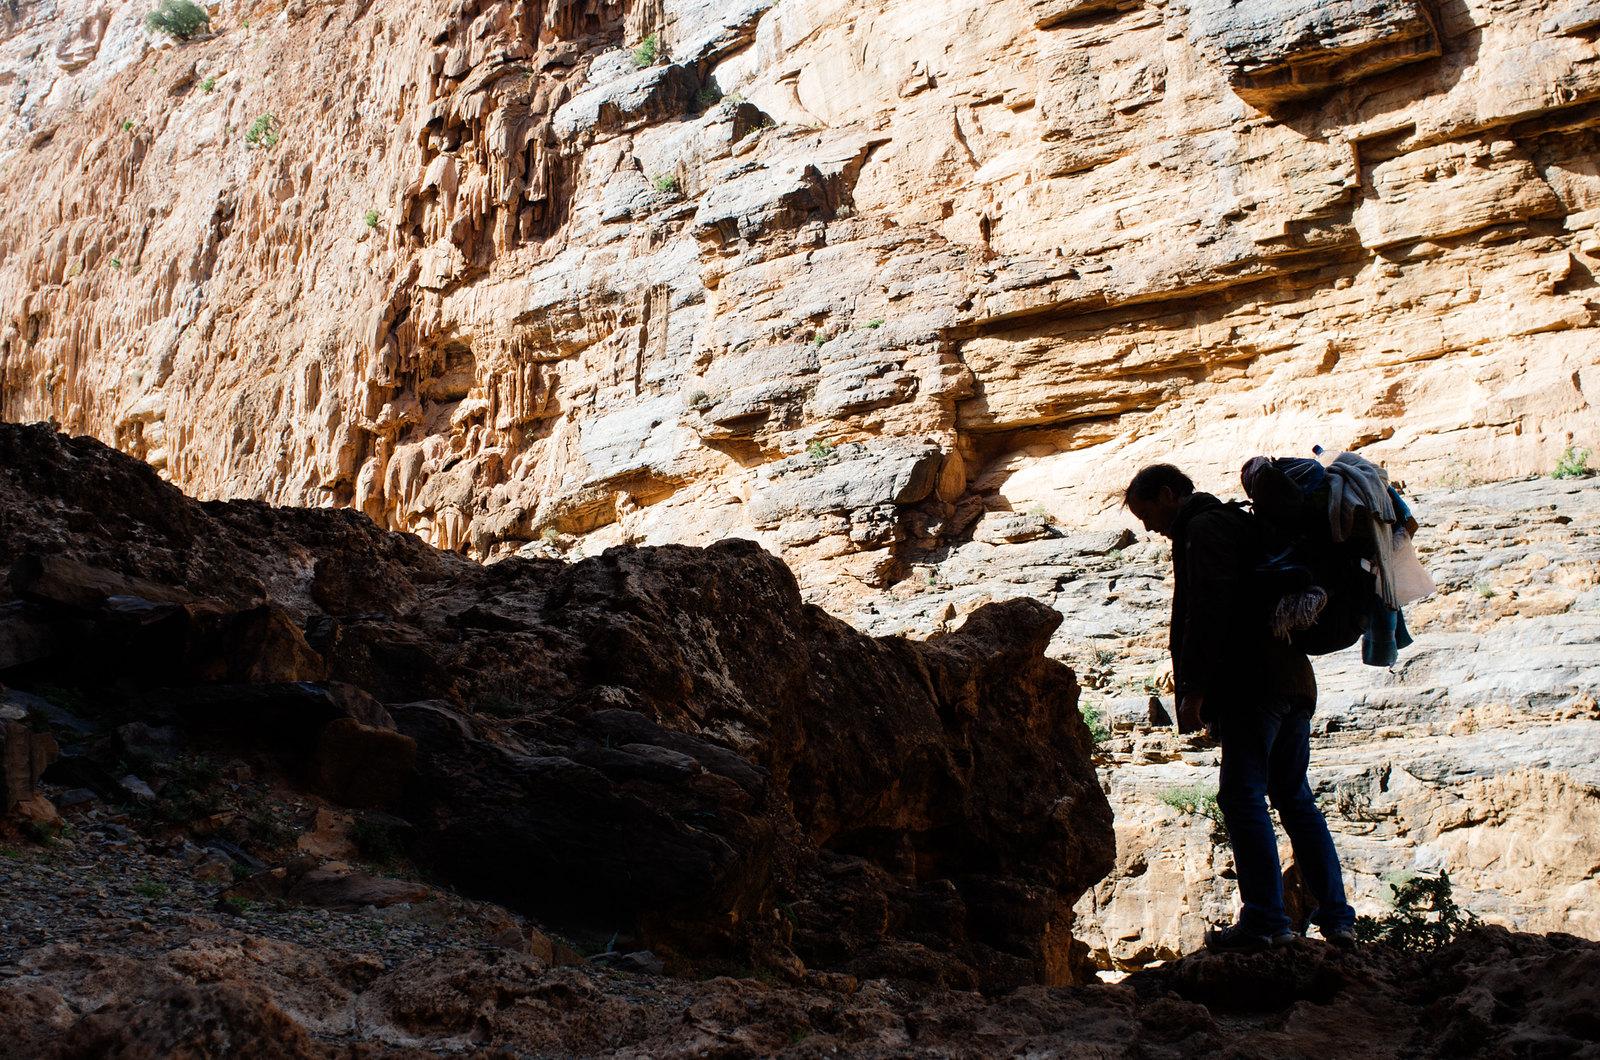 Amtoudi, anti-Atlas - 5 jours de trek au Maroc - Ombre chinoise